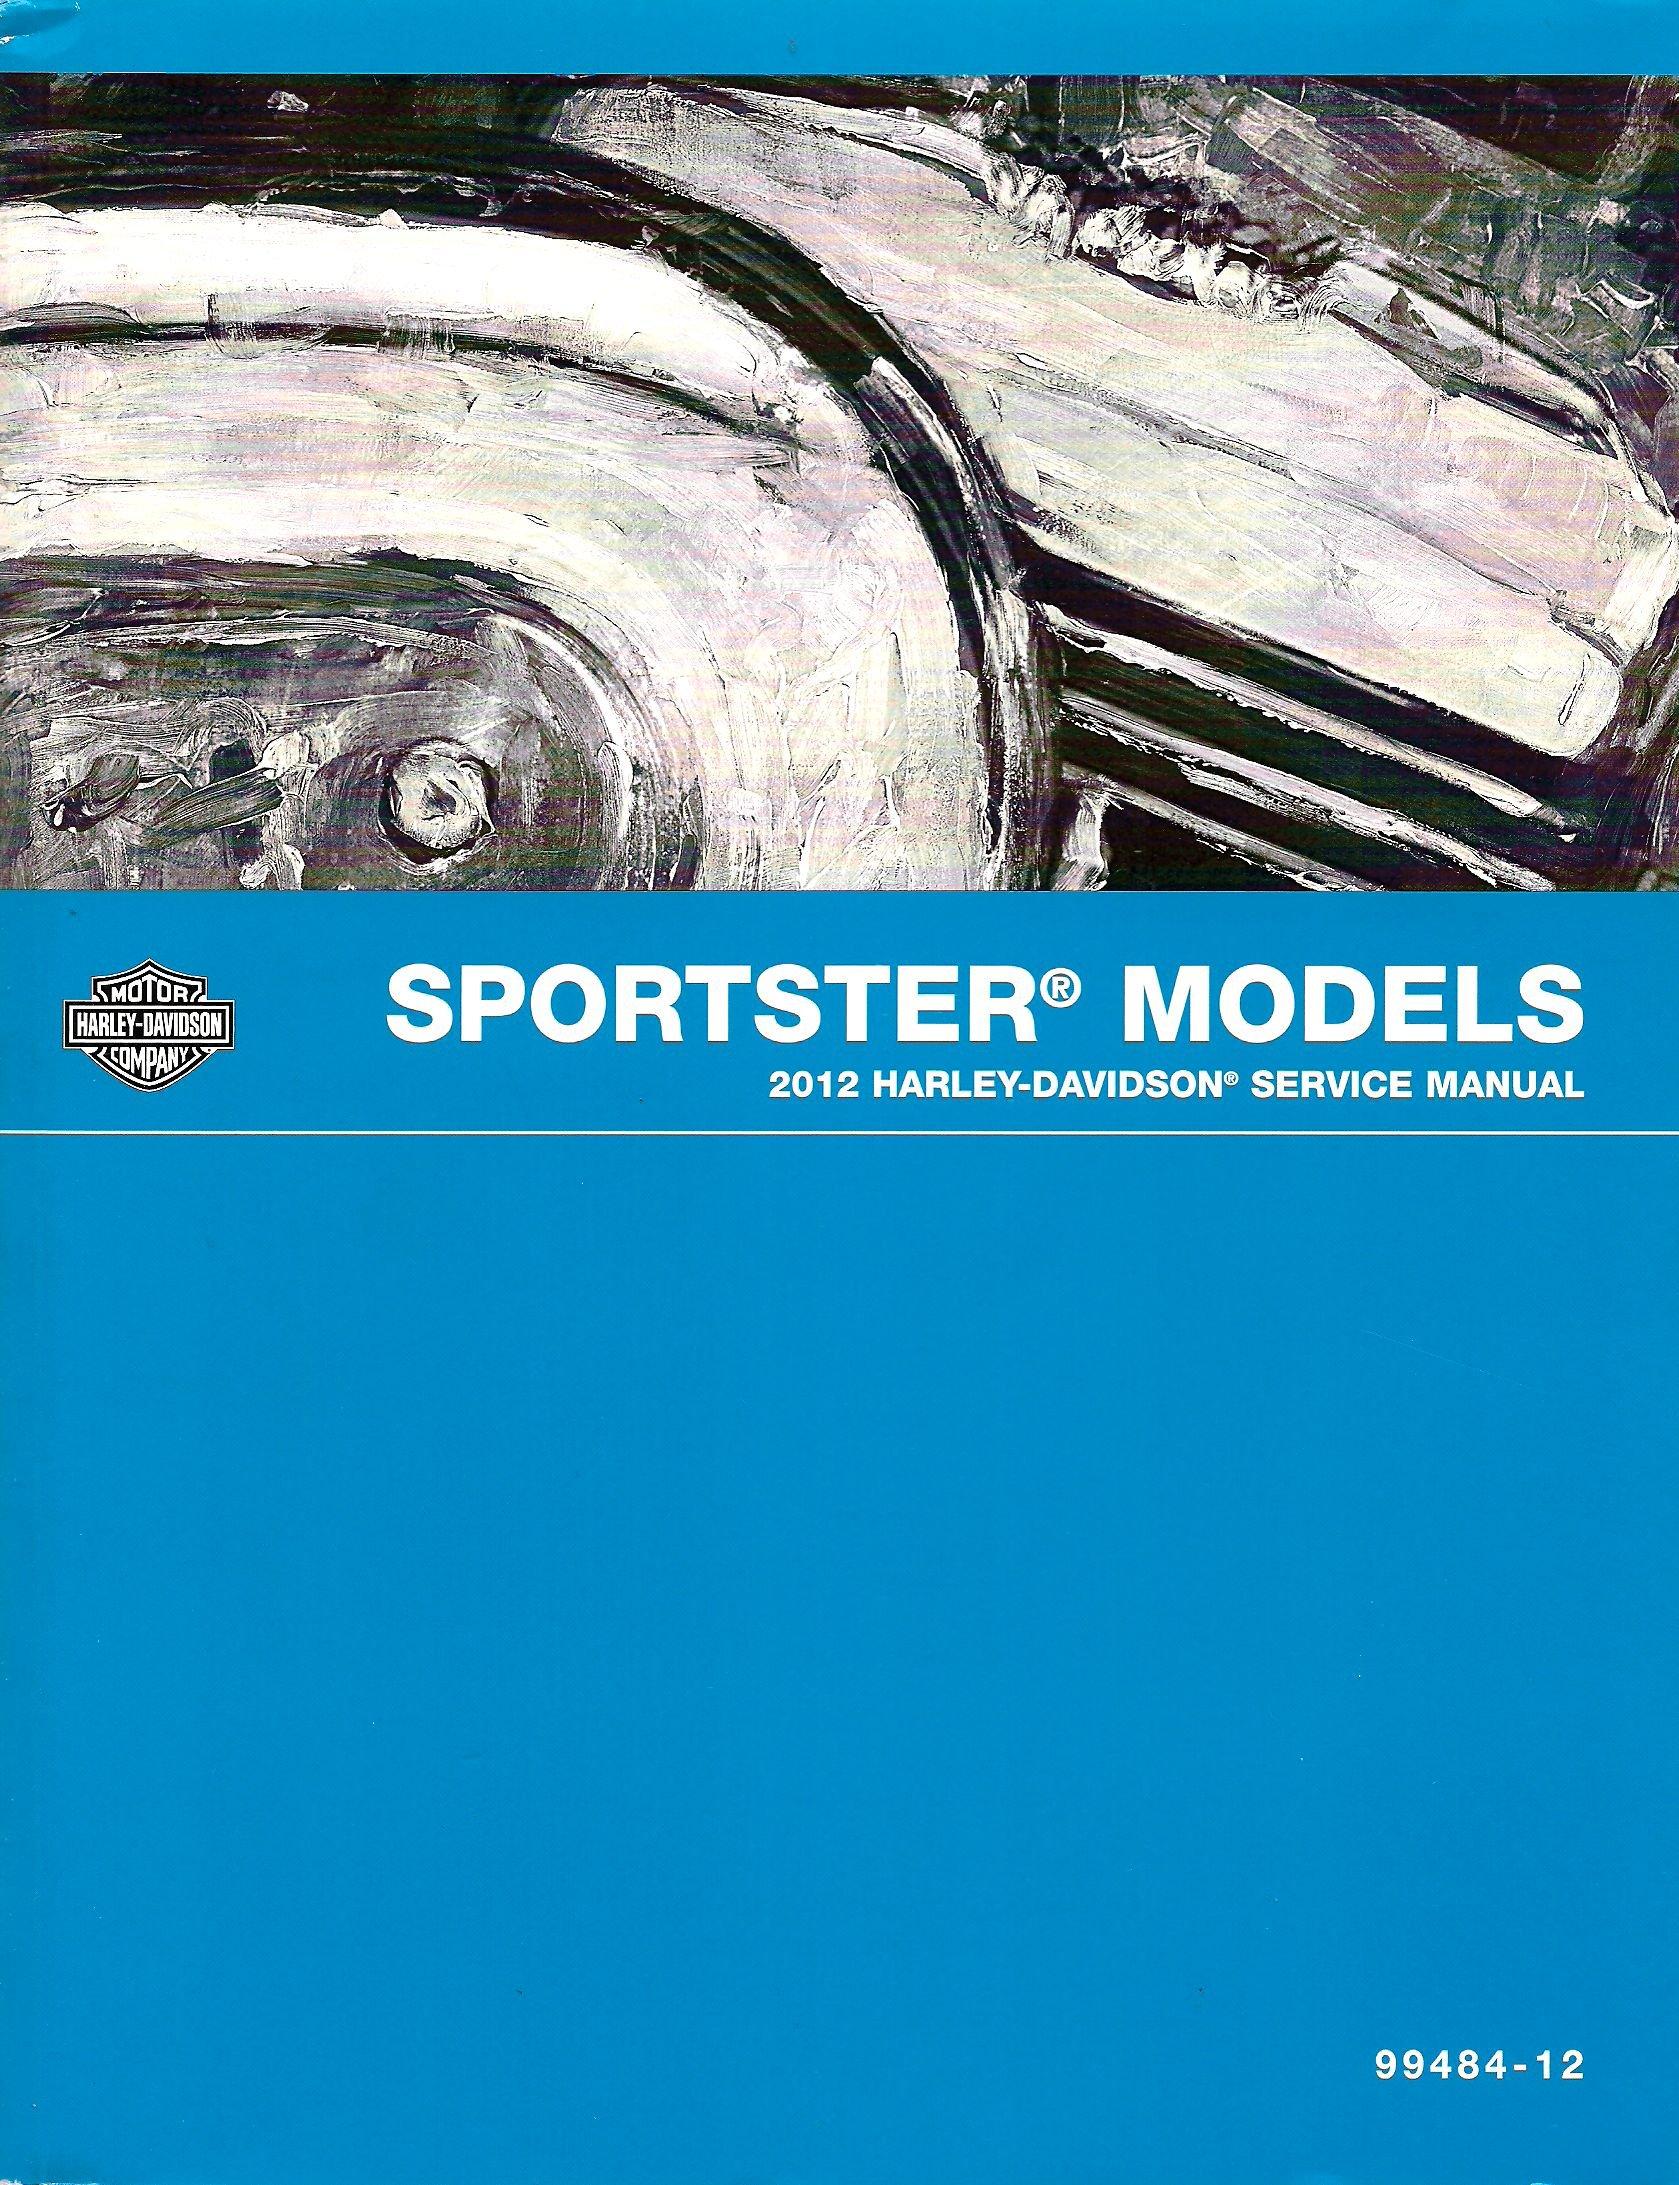 2012 Harley Davidson Sportster Models Service Manual, Part No. 99484-12:  Harley-Davidson Motor Company: Amazon.com: Books